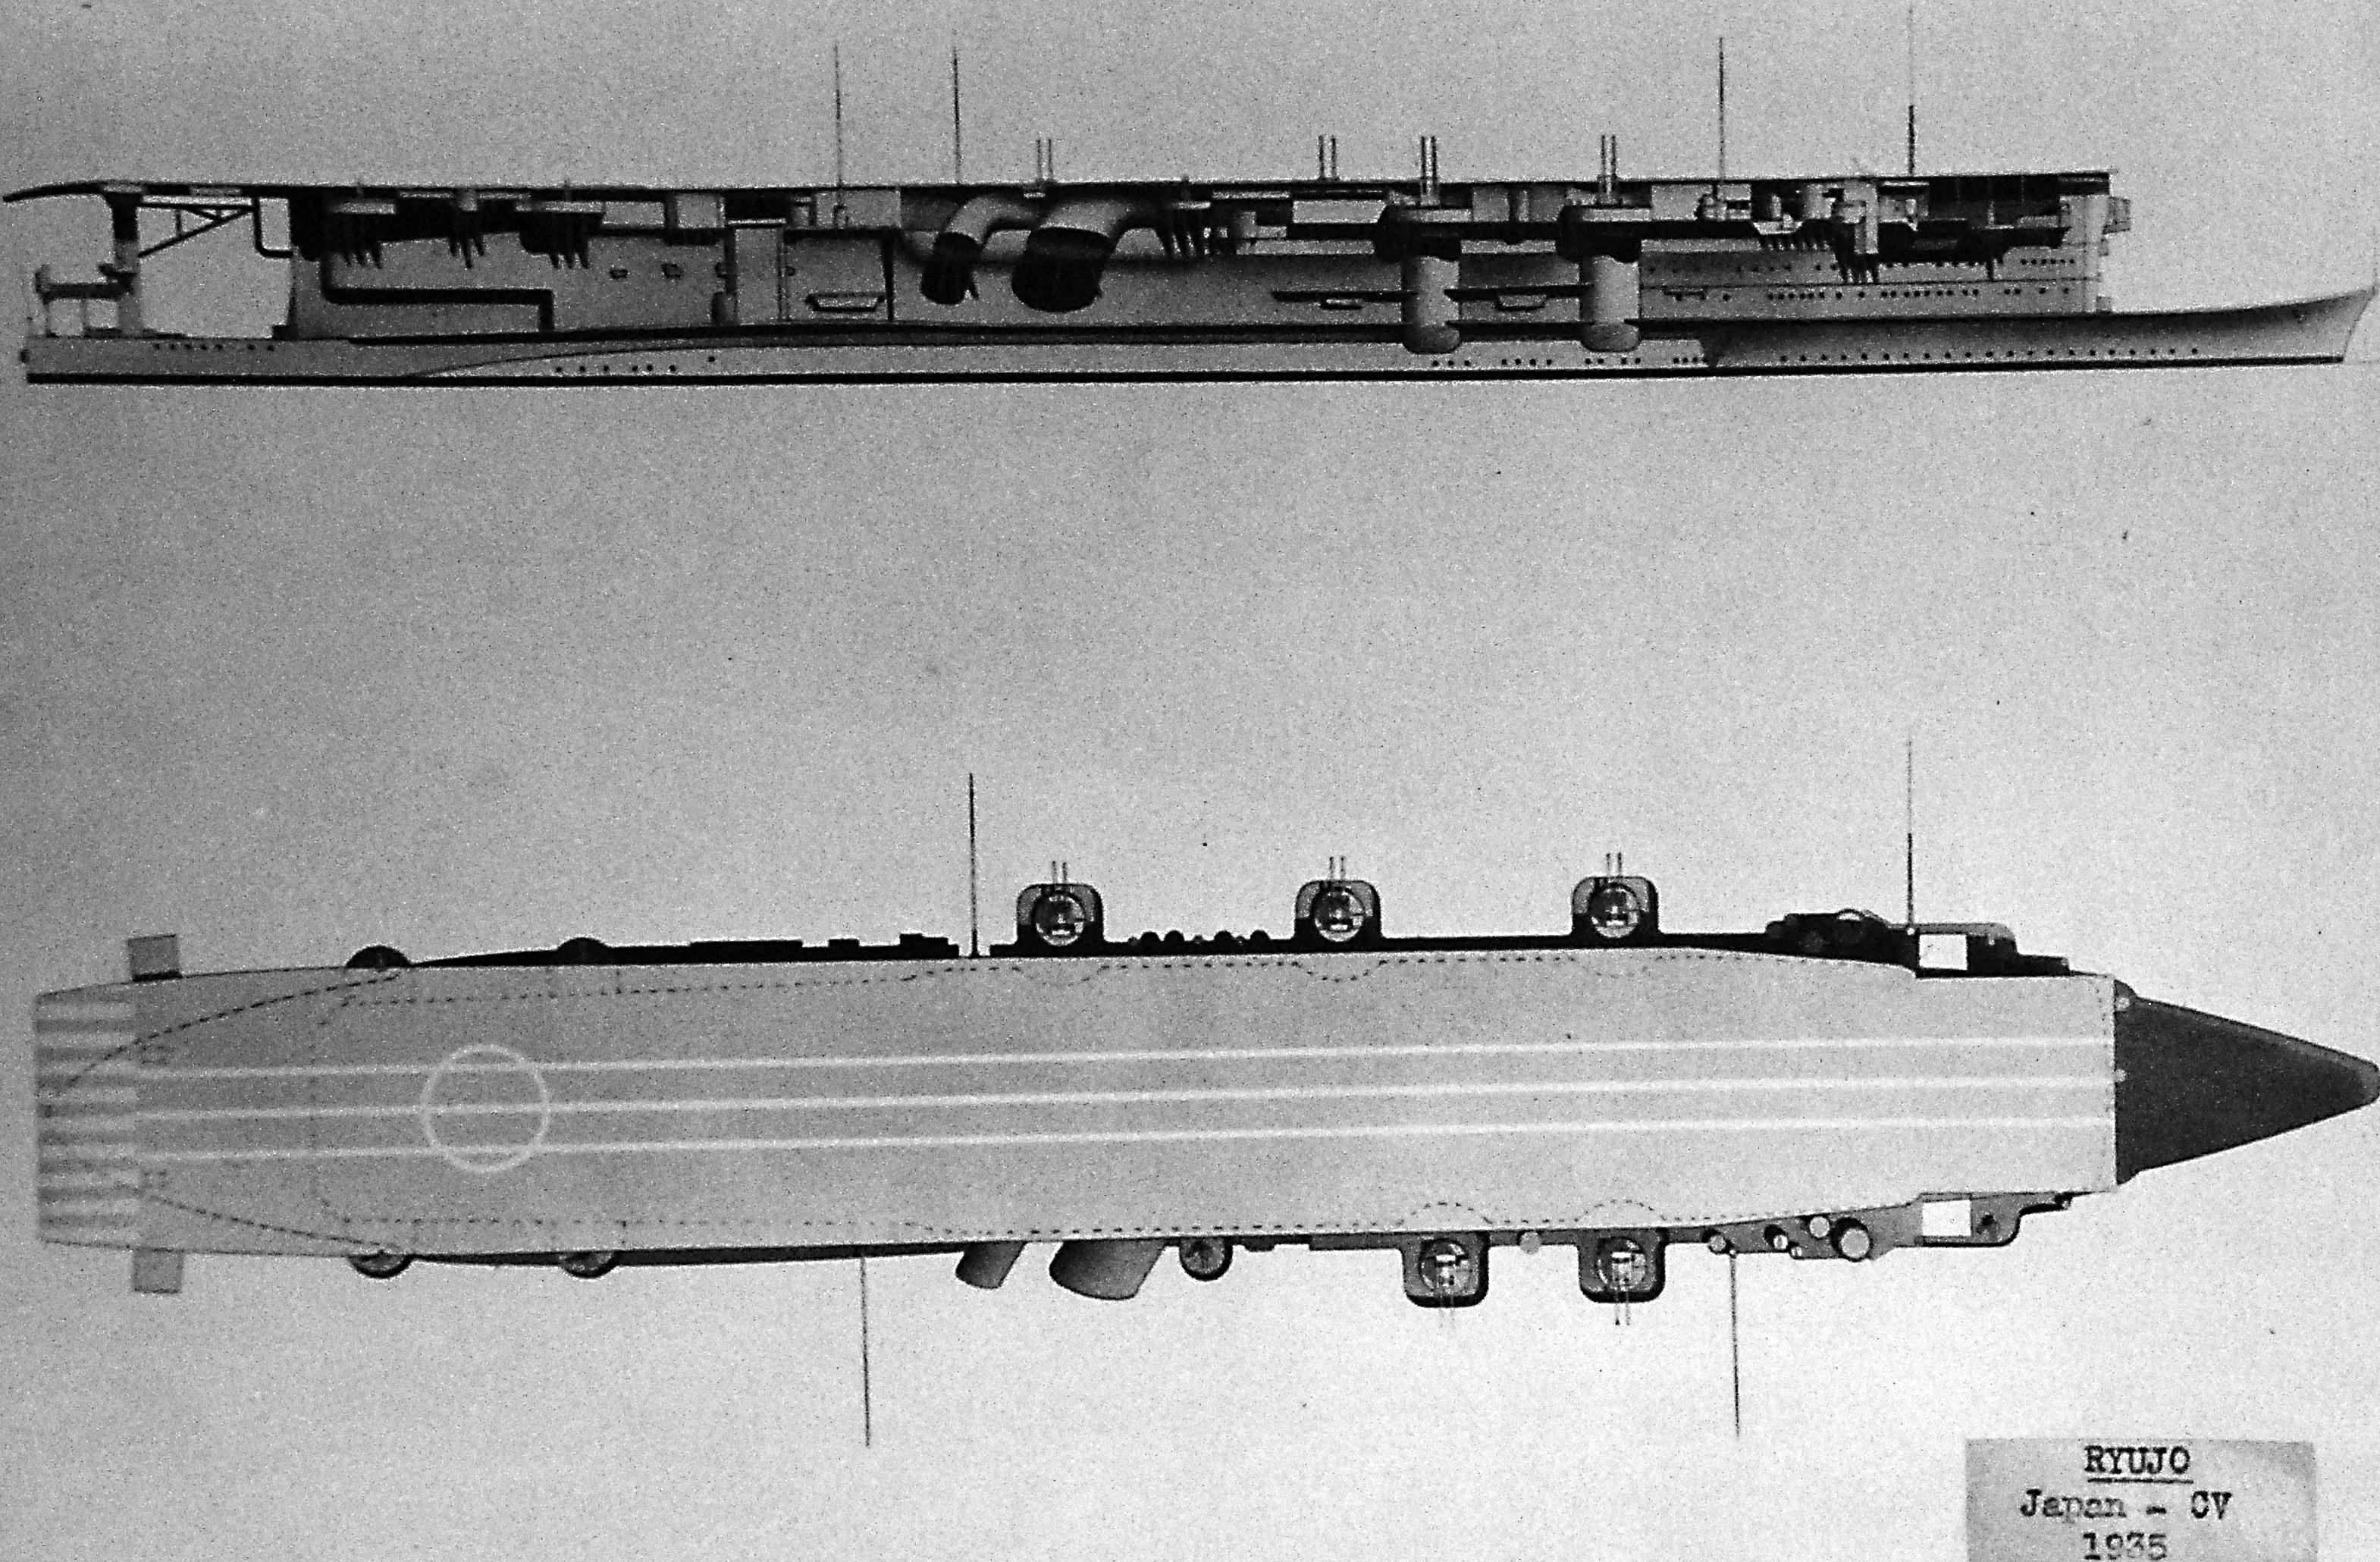 filejapanese aircraft carrier ryujo diagrams 1935 26878695392